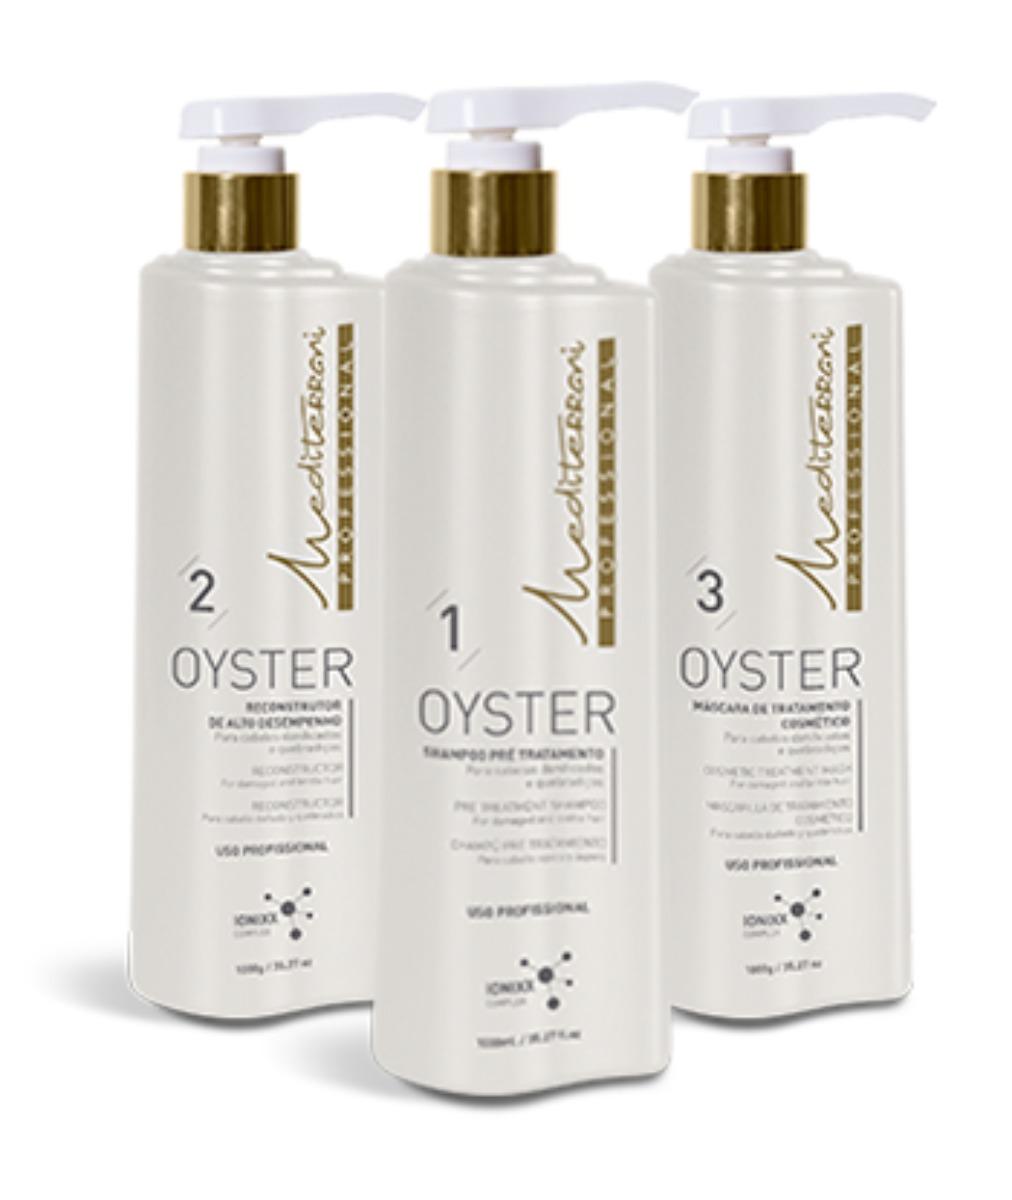 Oyster Repair Reconstrução Mediterrani (3 x...